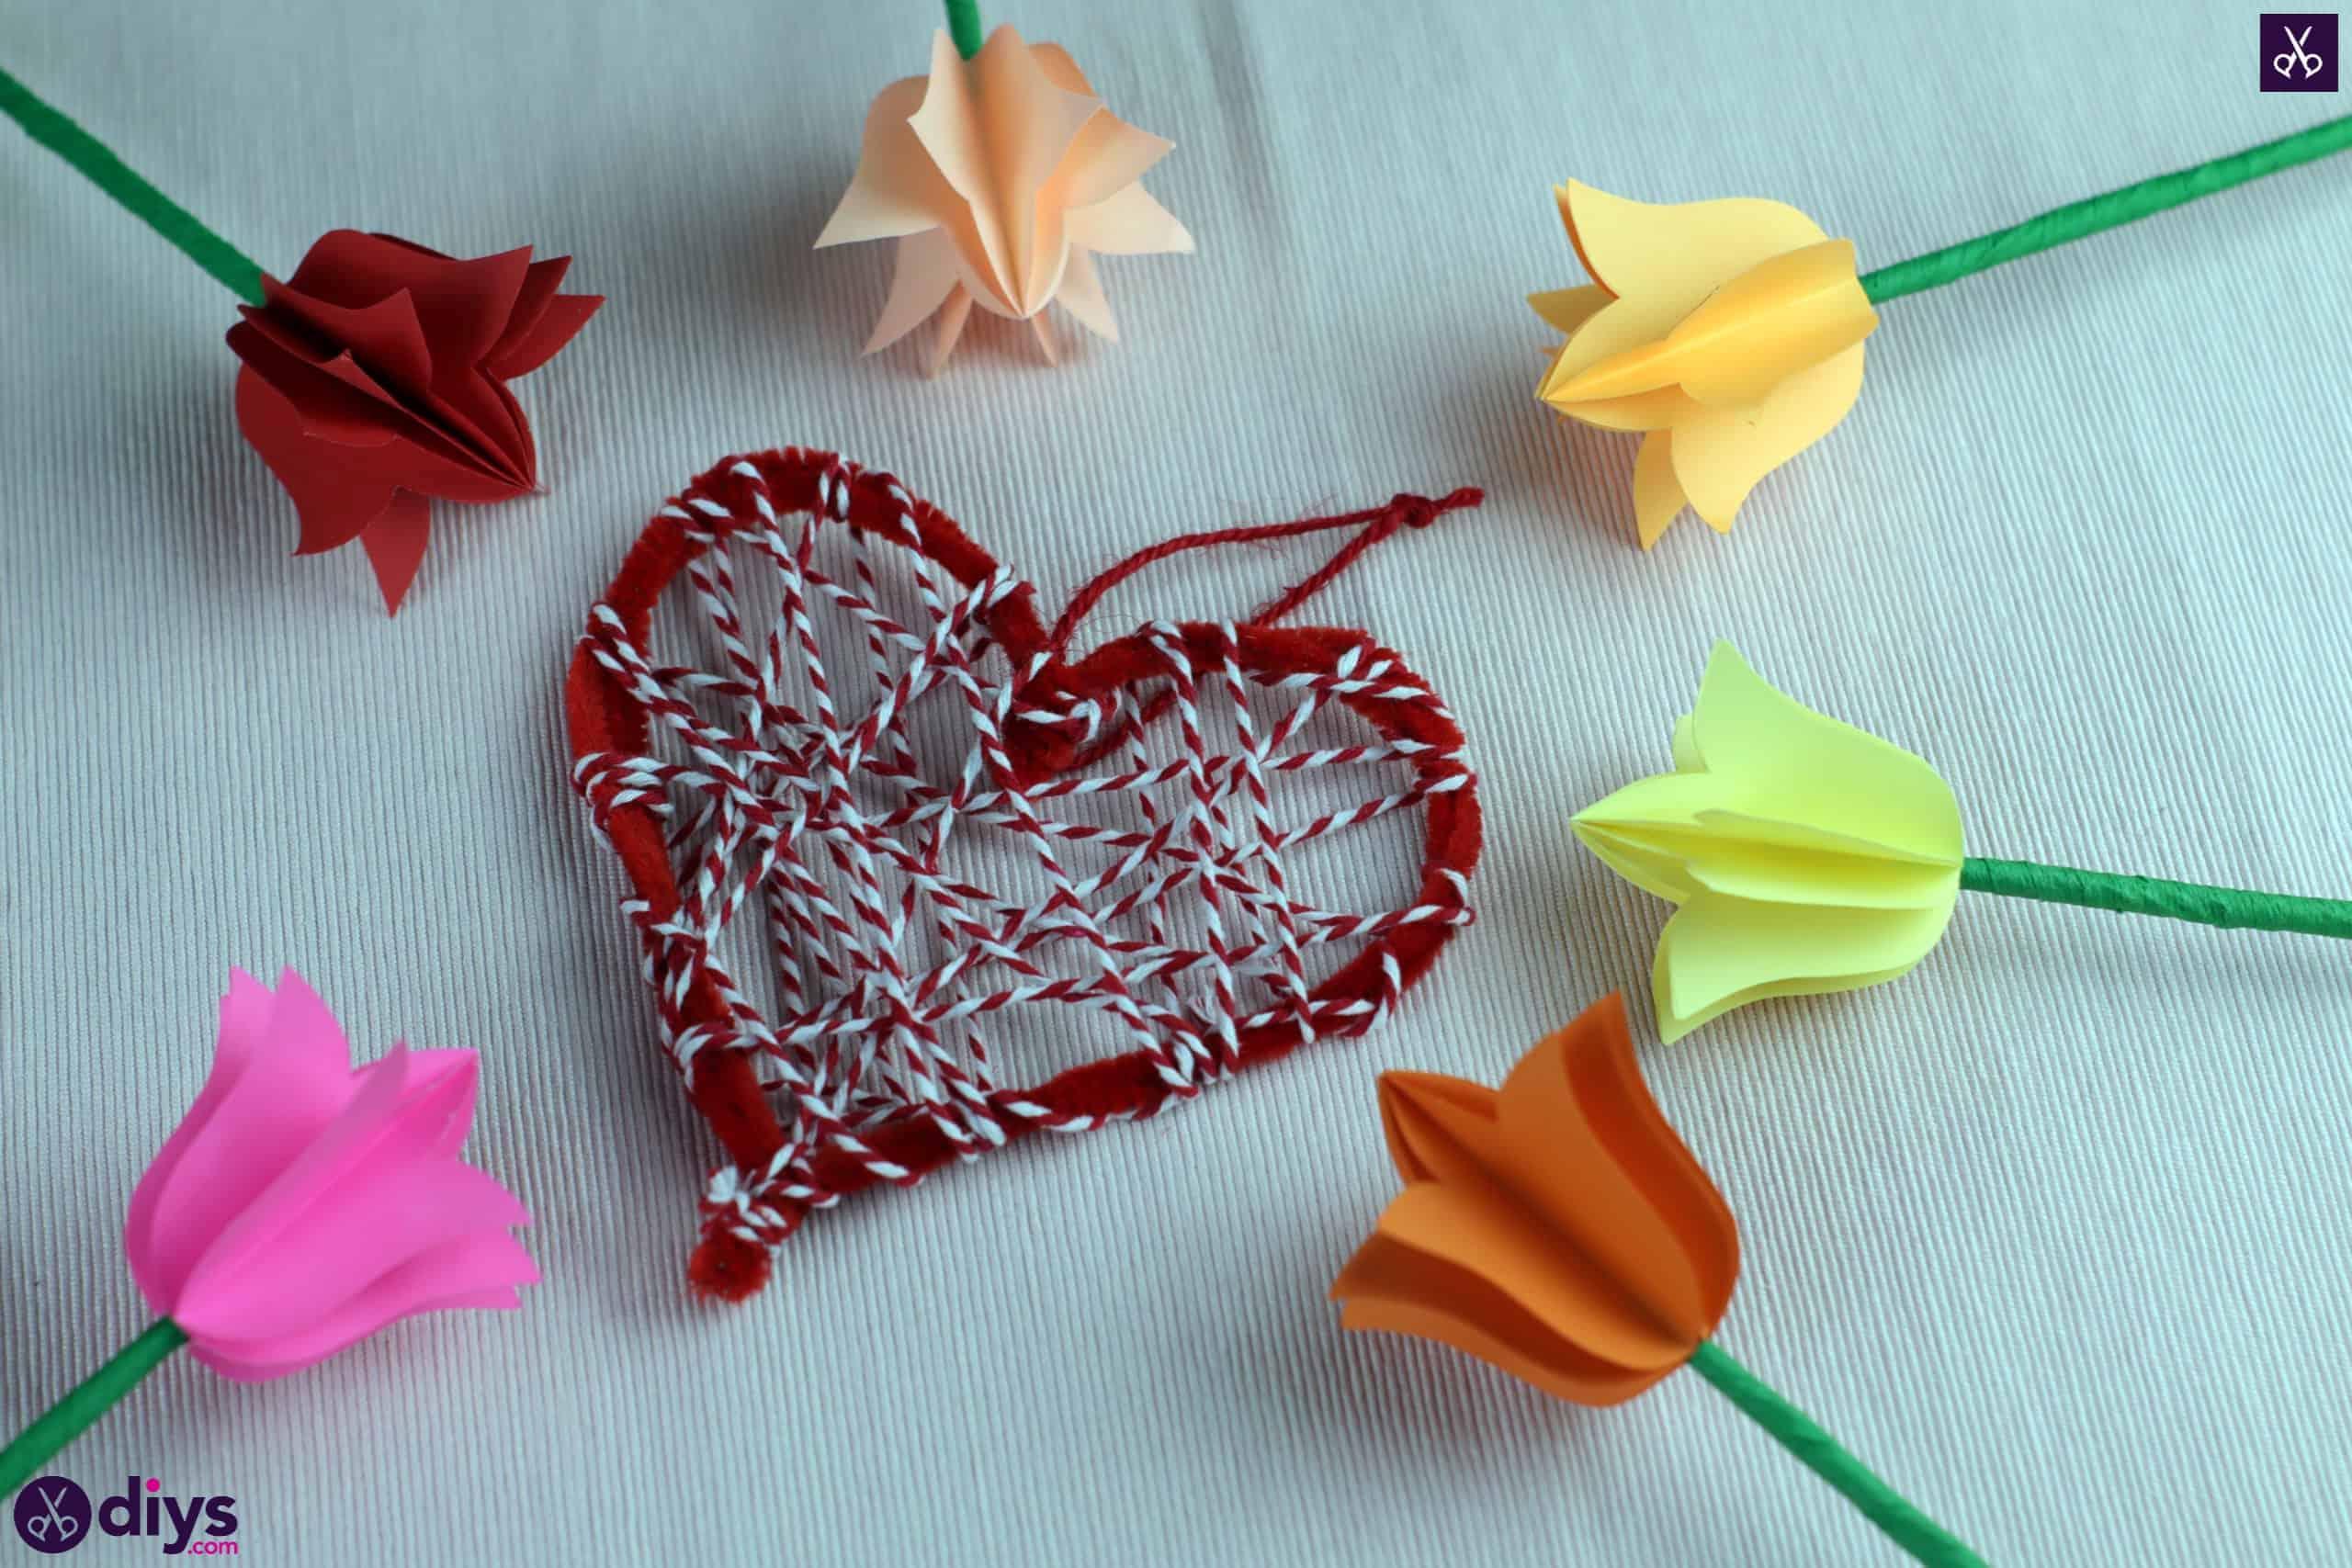 Diy hanging heart wall decor yarn